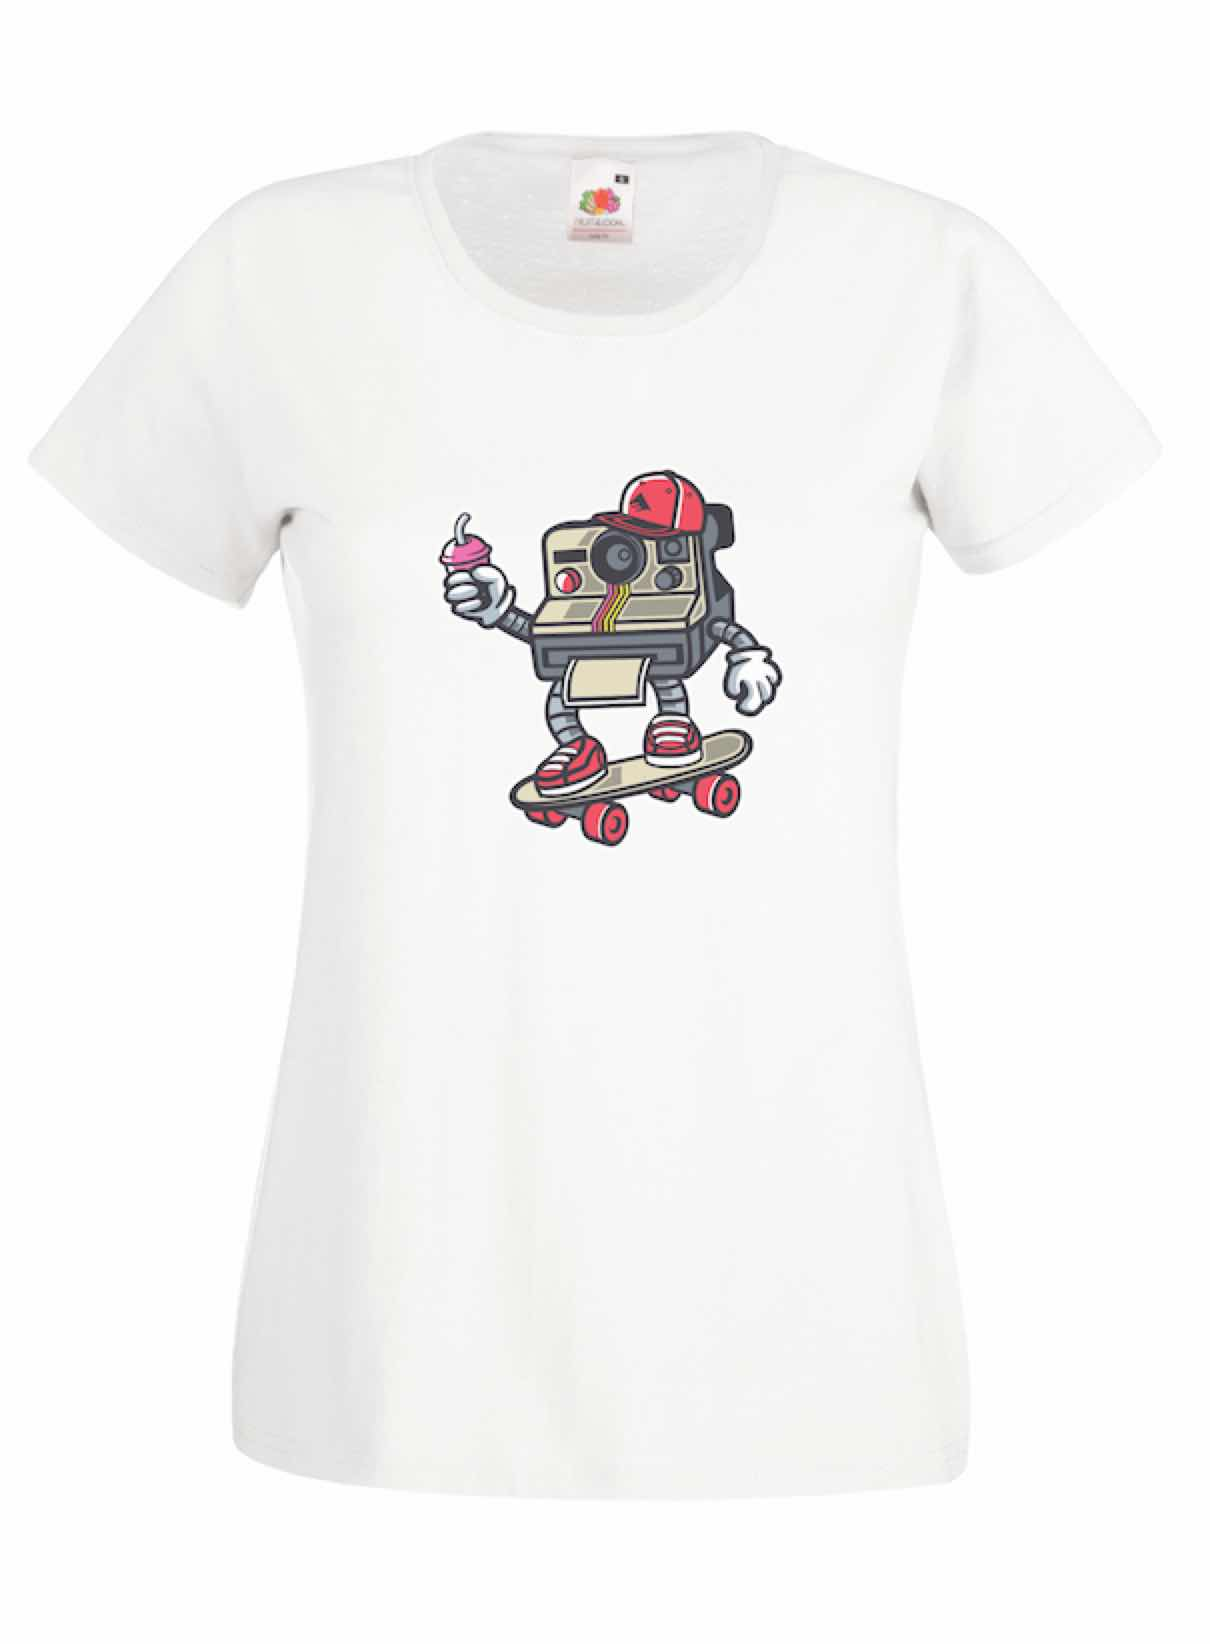 Polaroid design for t-shirt, hoodie & sweatshirt